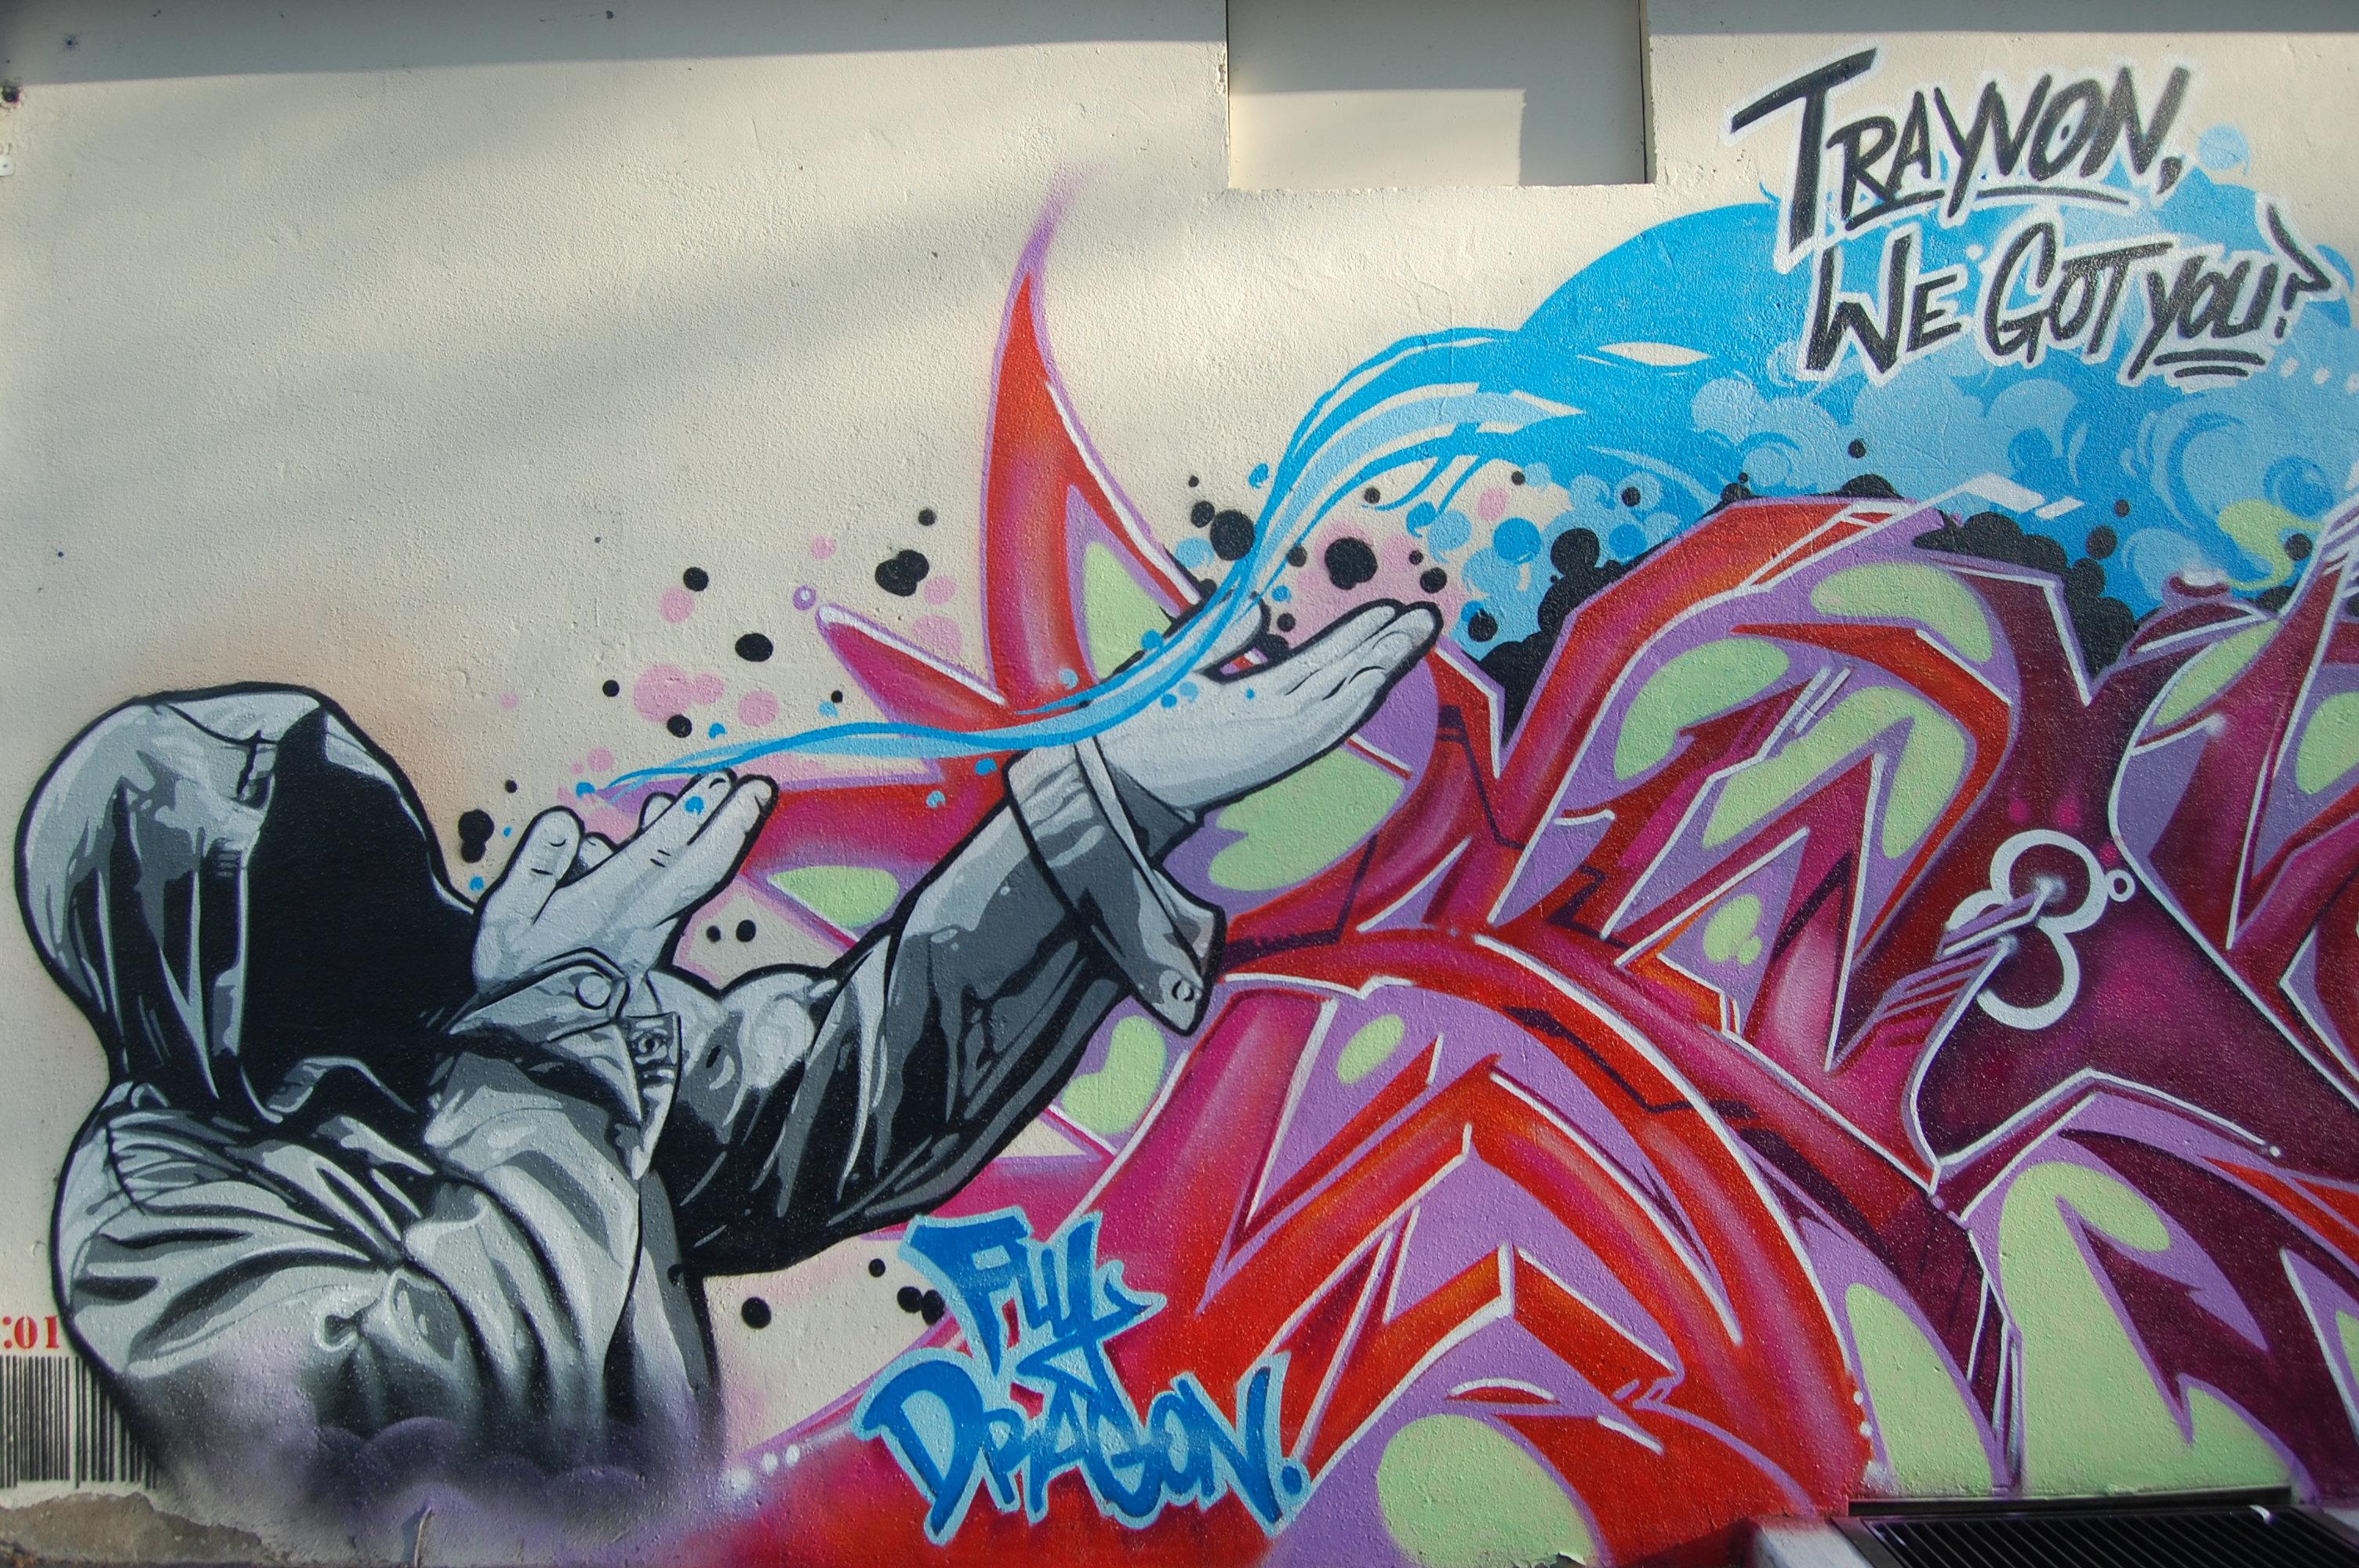 Planet chocko art music movies beyond nj graffiti for Graffiti mural